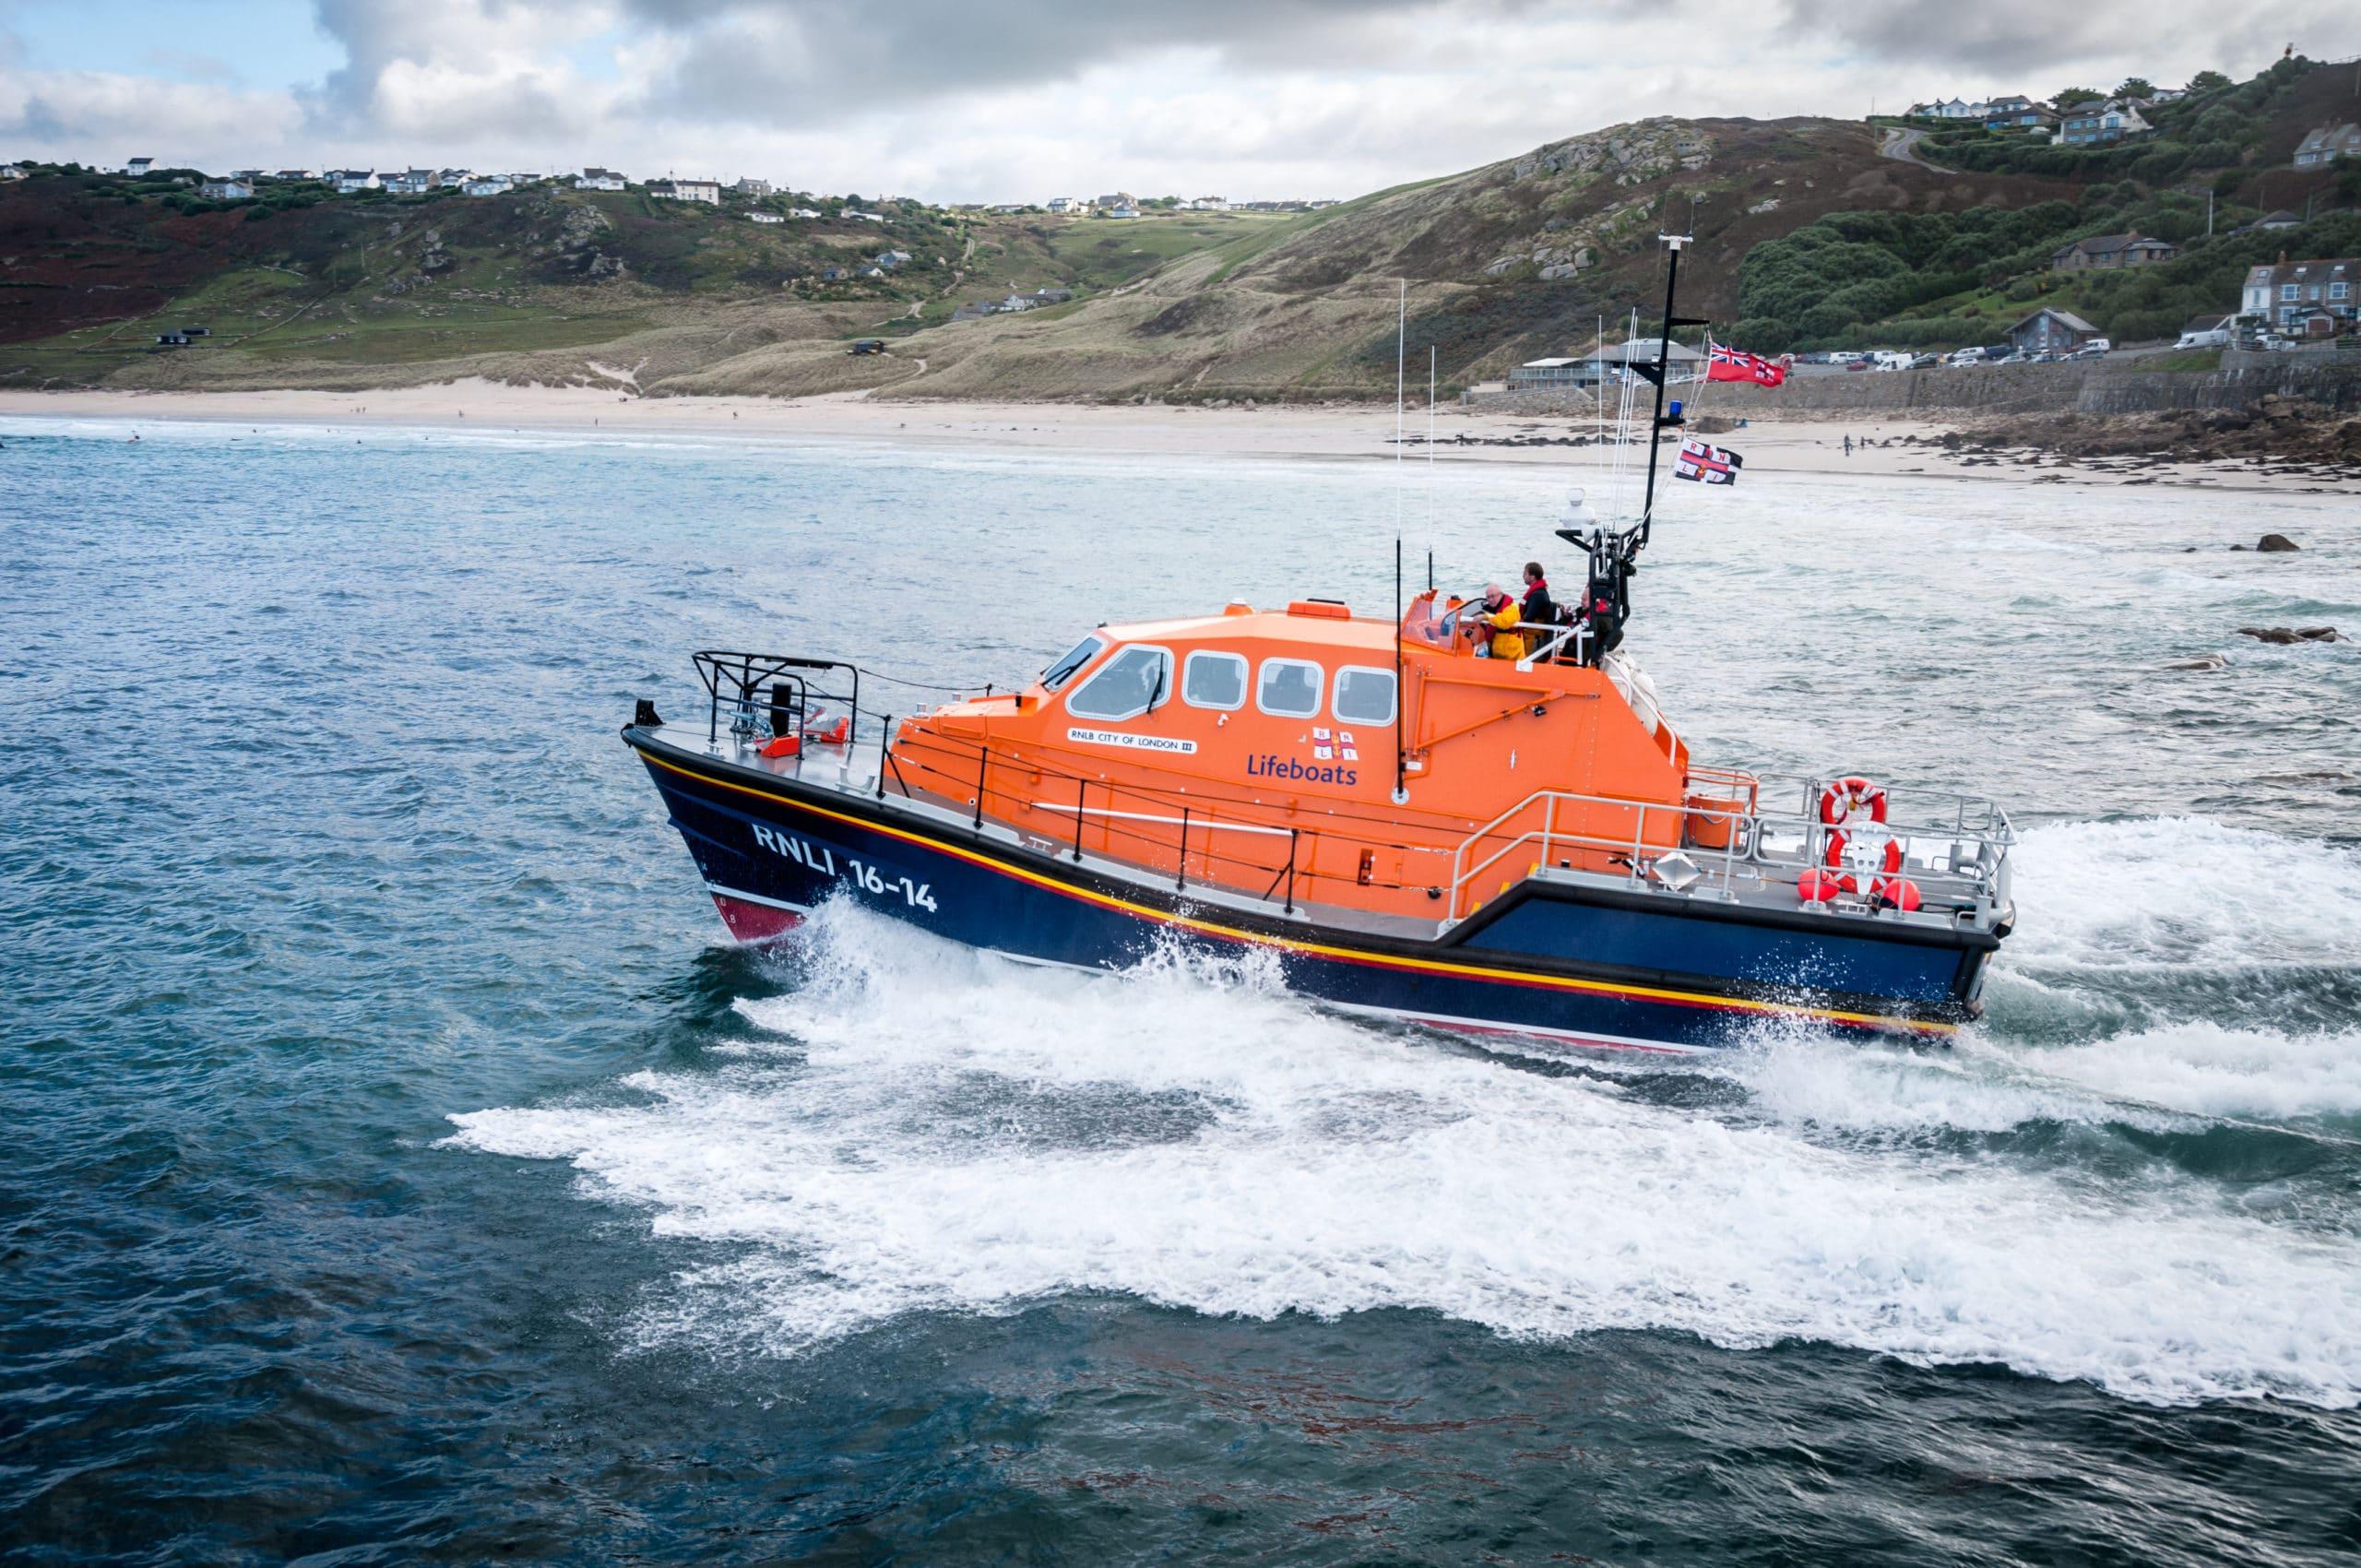 Life Boat Launch